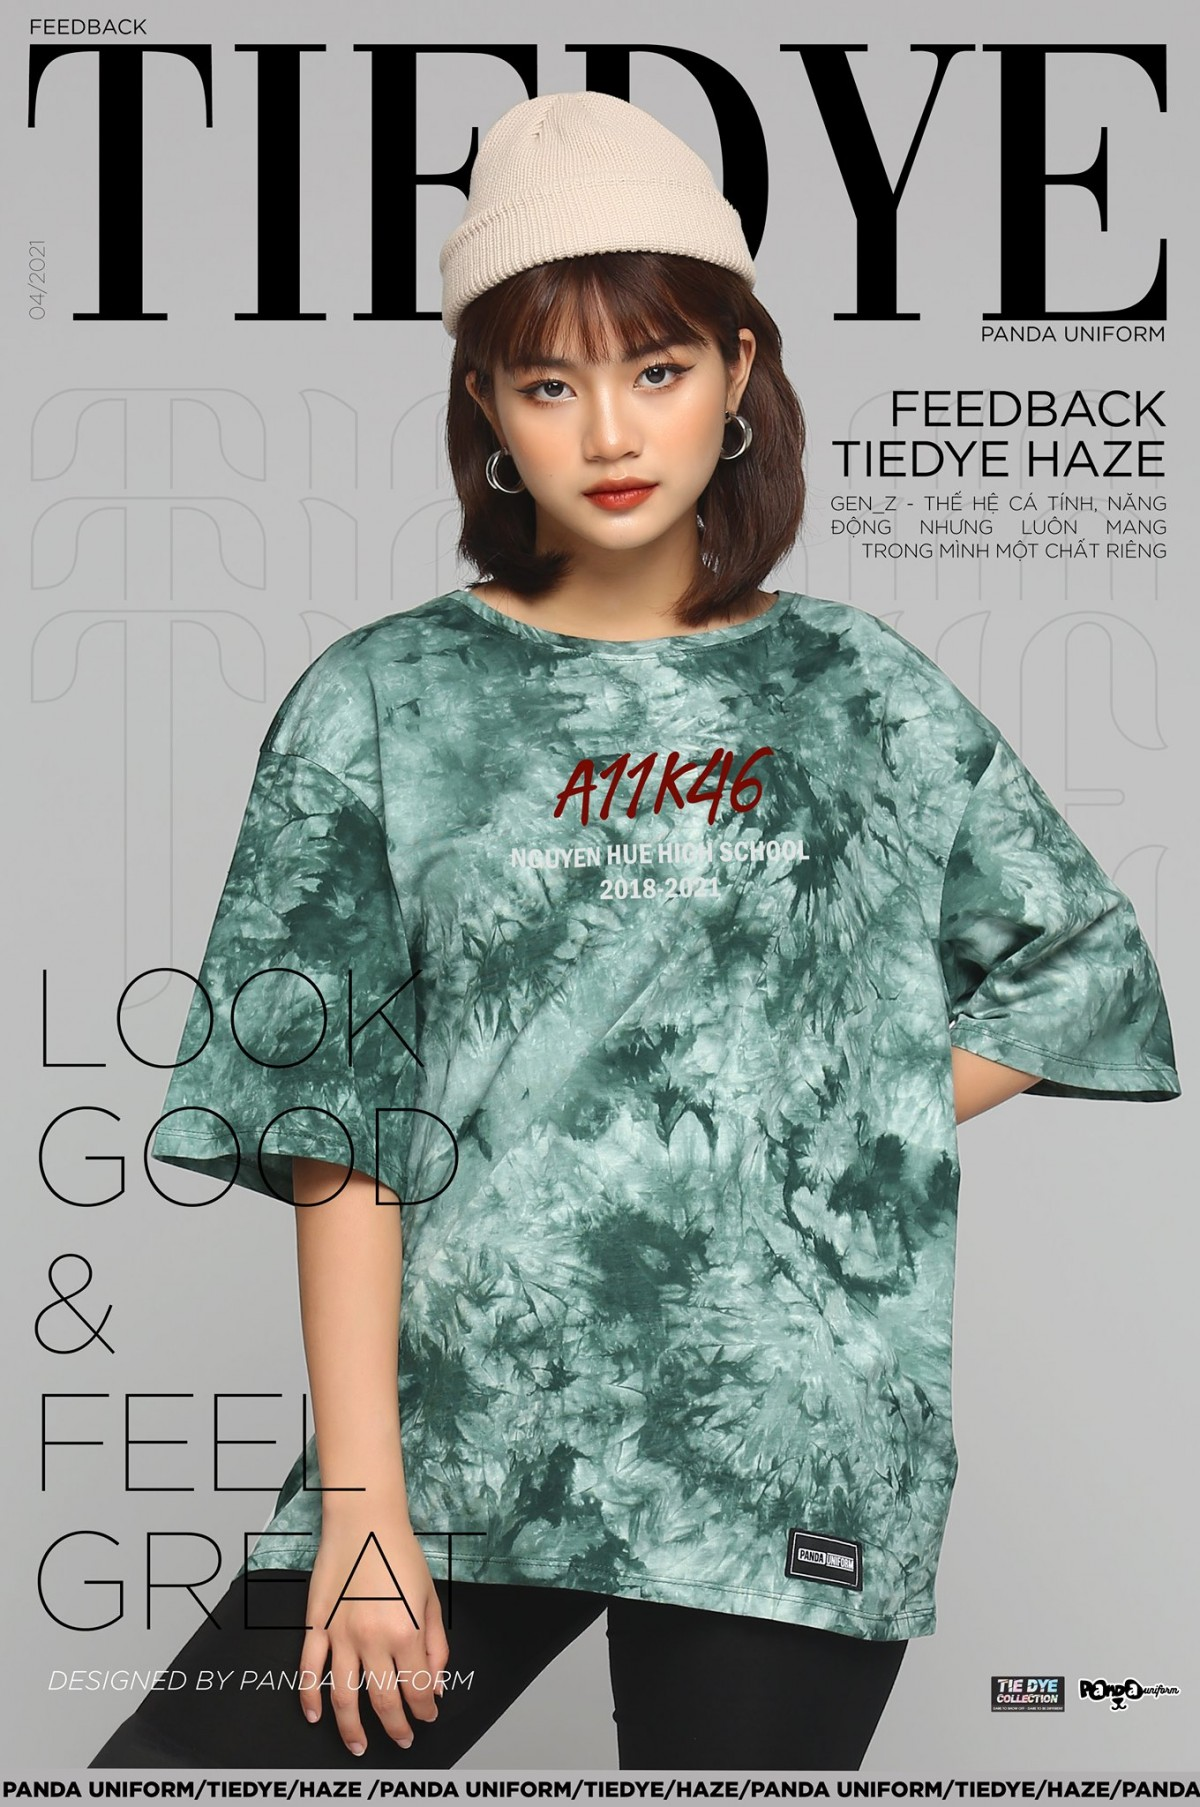 [HN] Panda Uniform tuyển dụng Graphic Designer